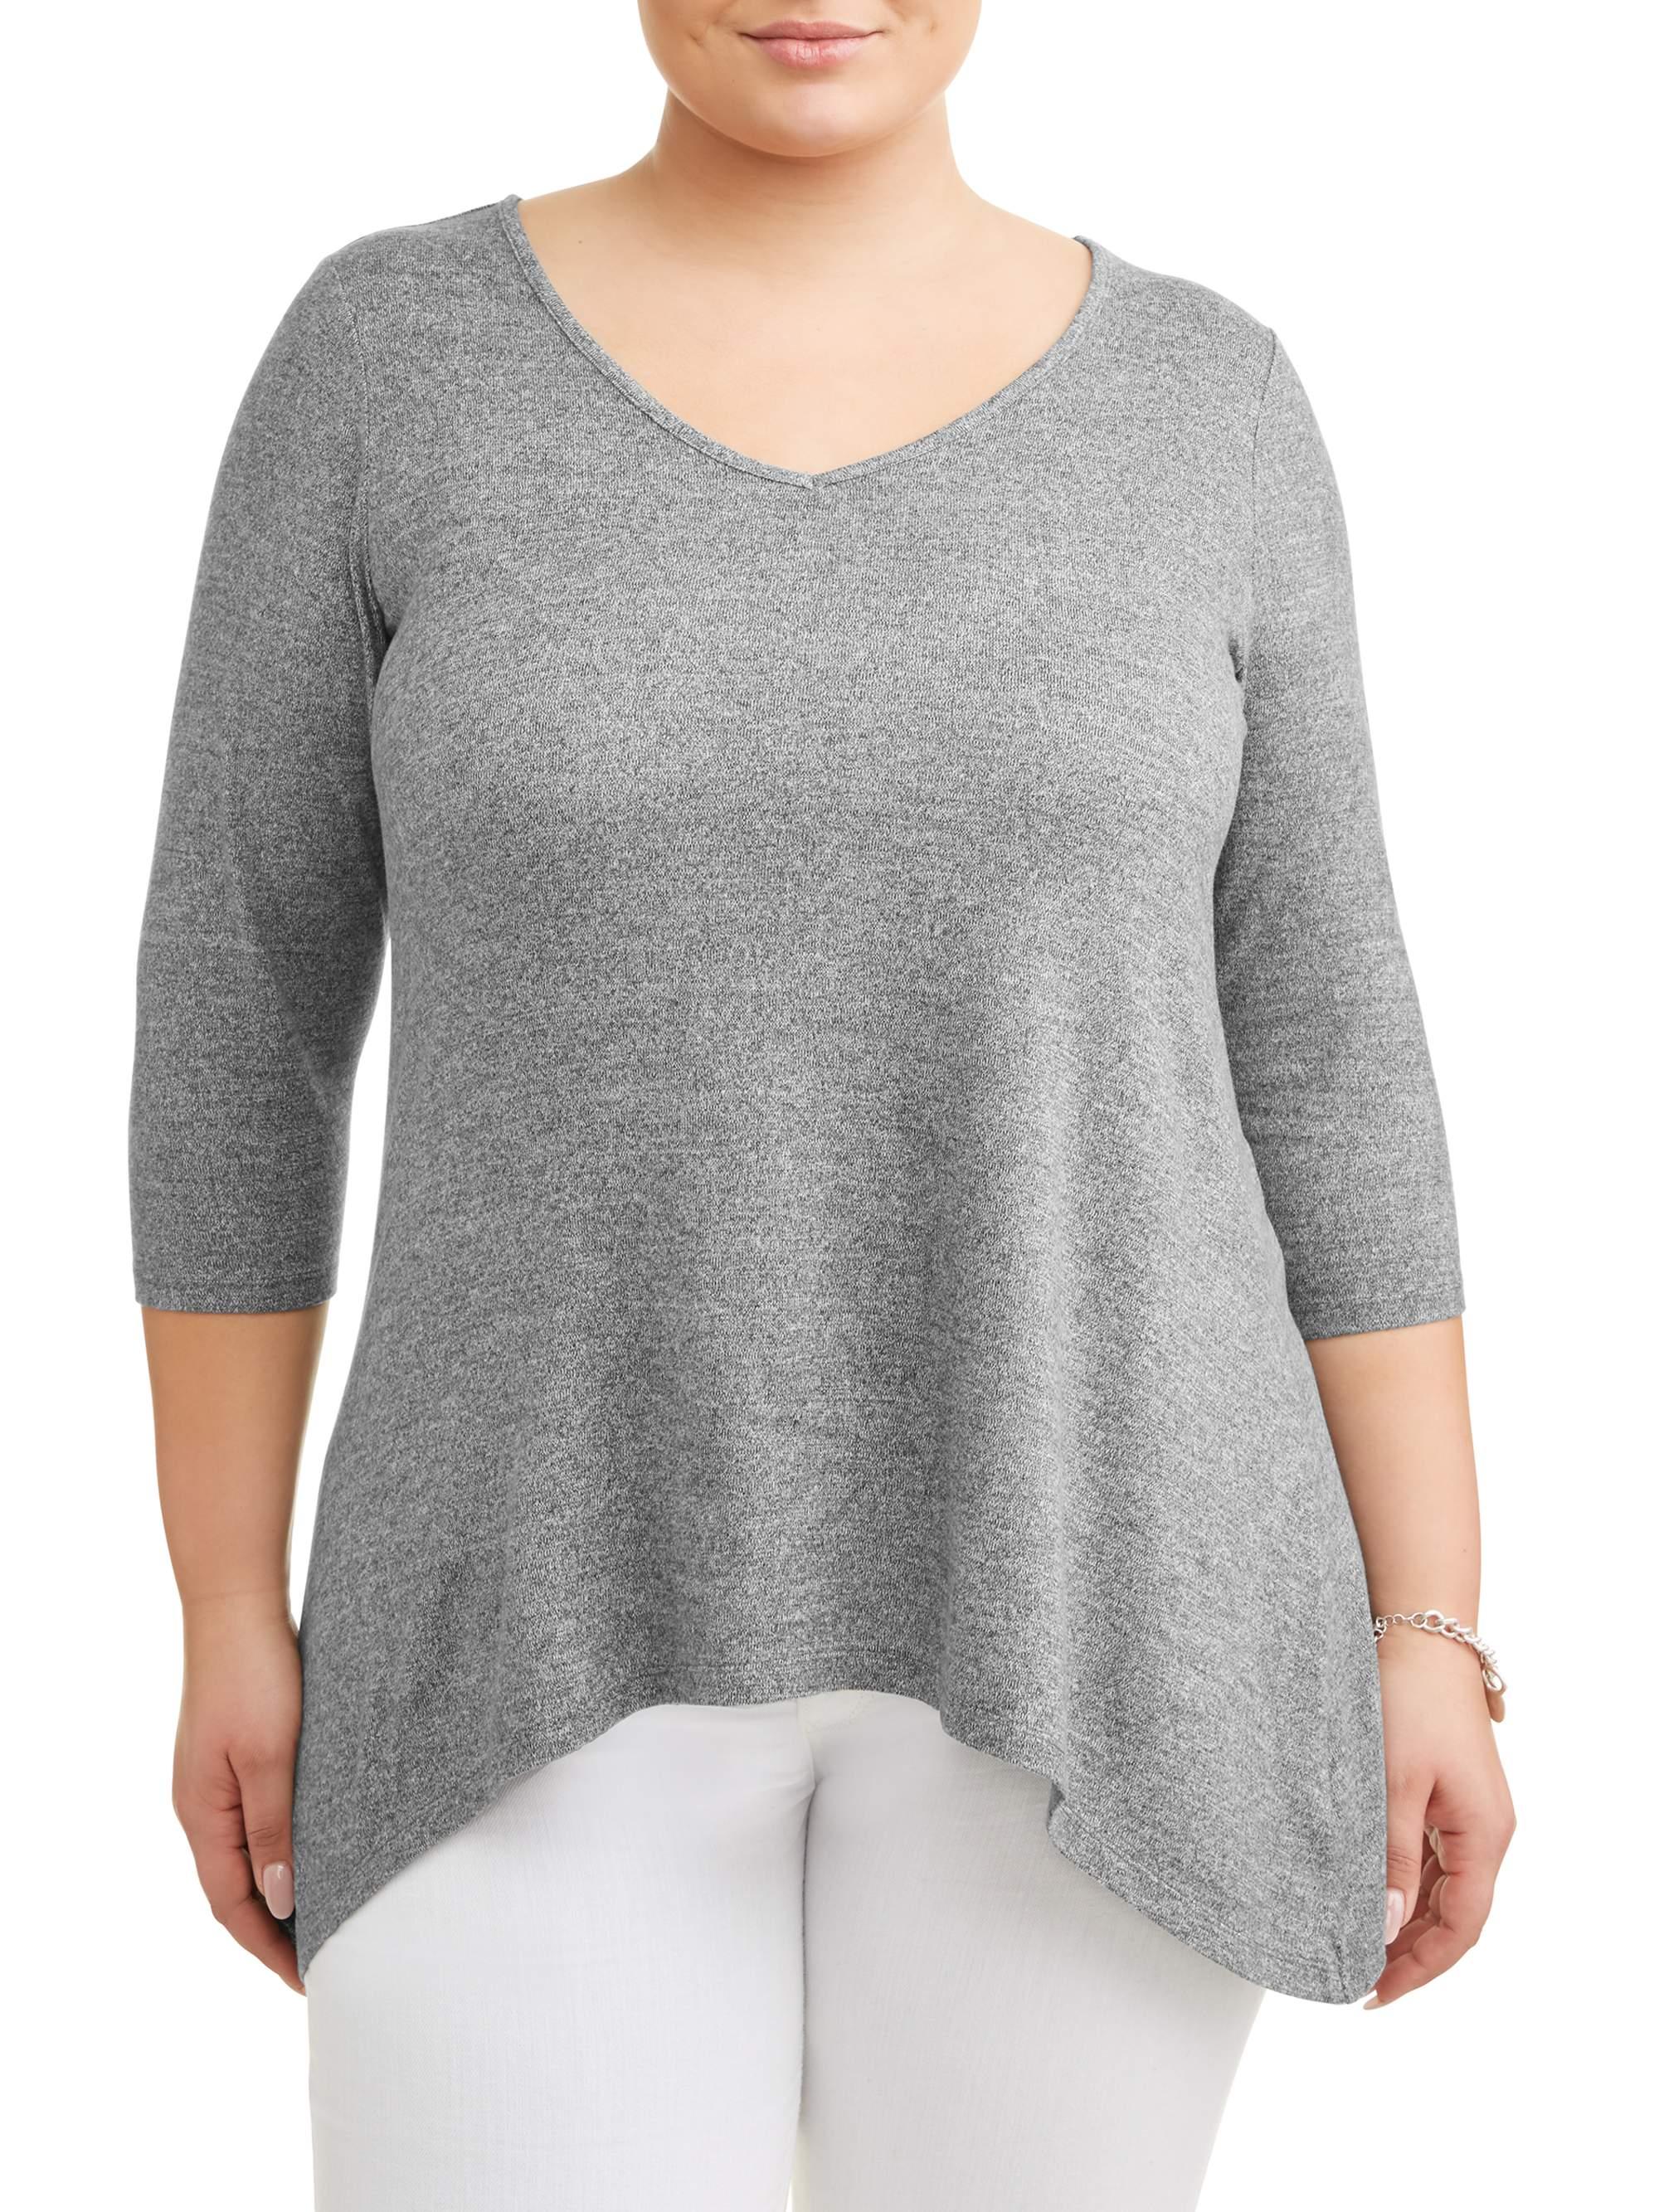 Women's Plus Size Soft Hacci Sharkbite Lattice Top